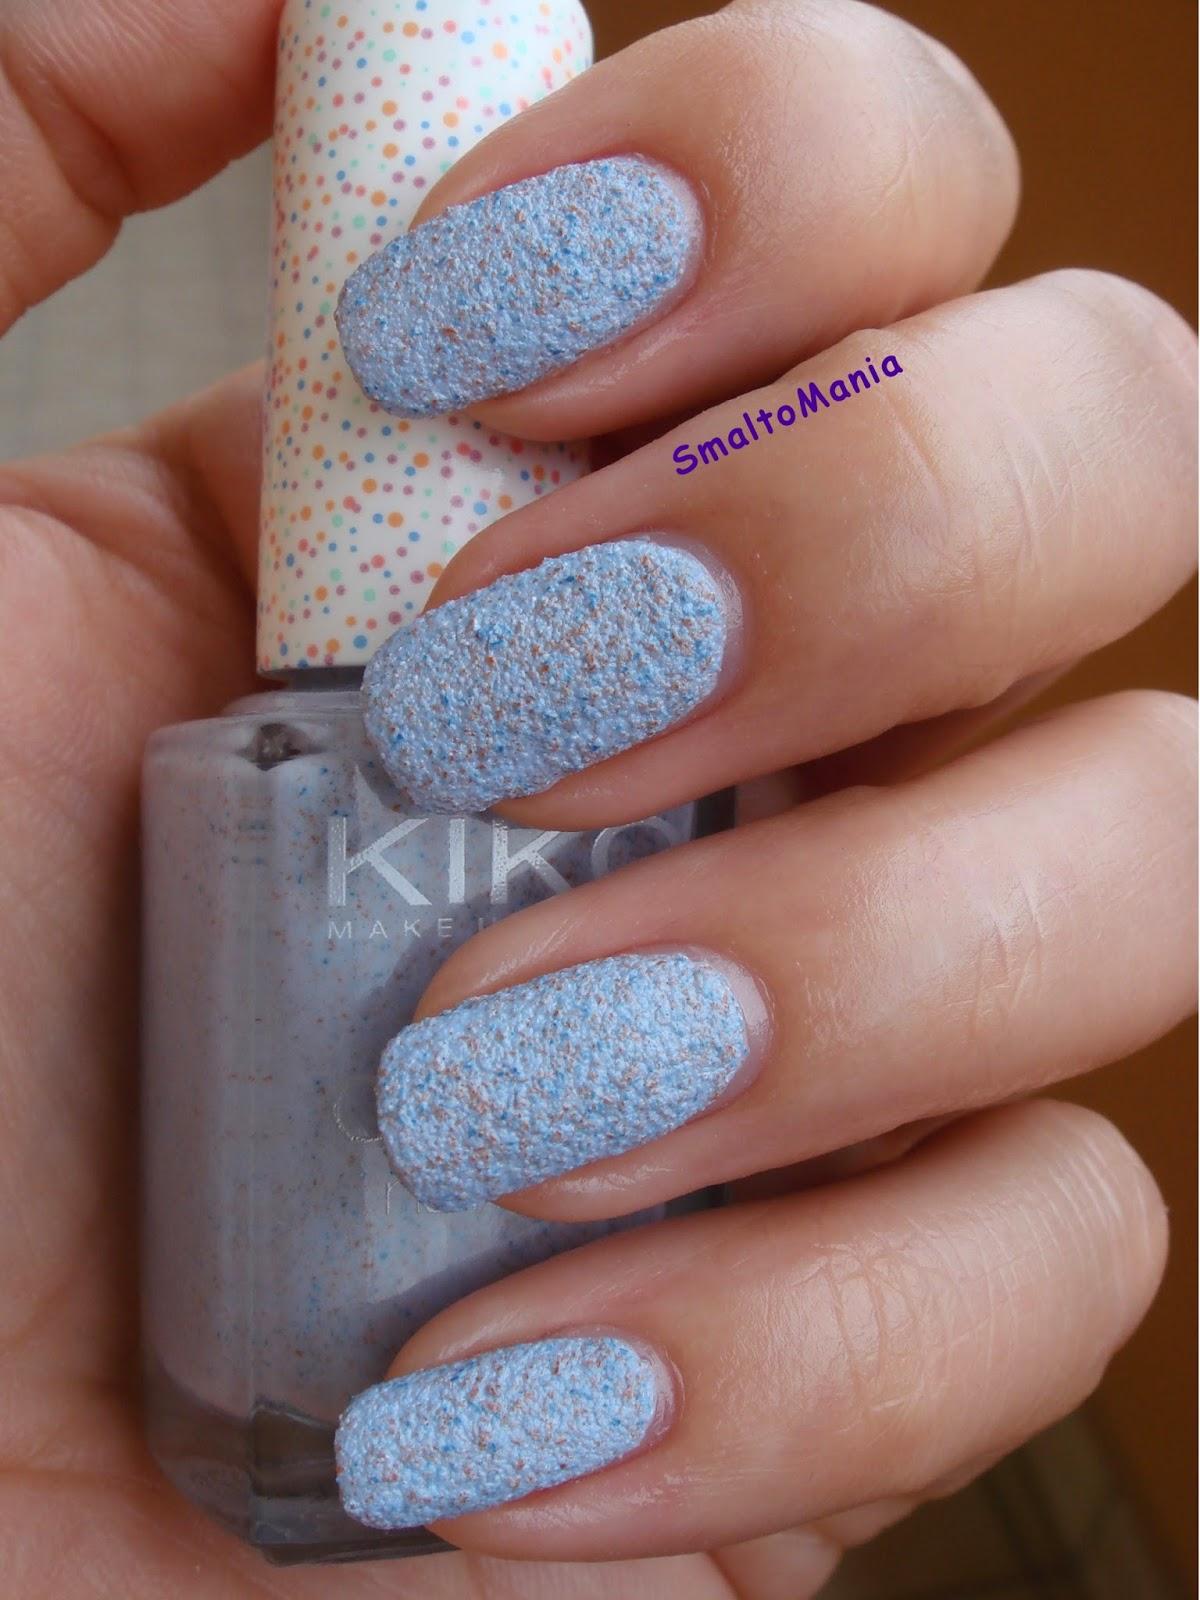 Kiko Cupcake n.653 Glicine